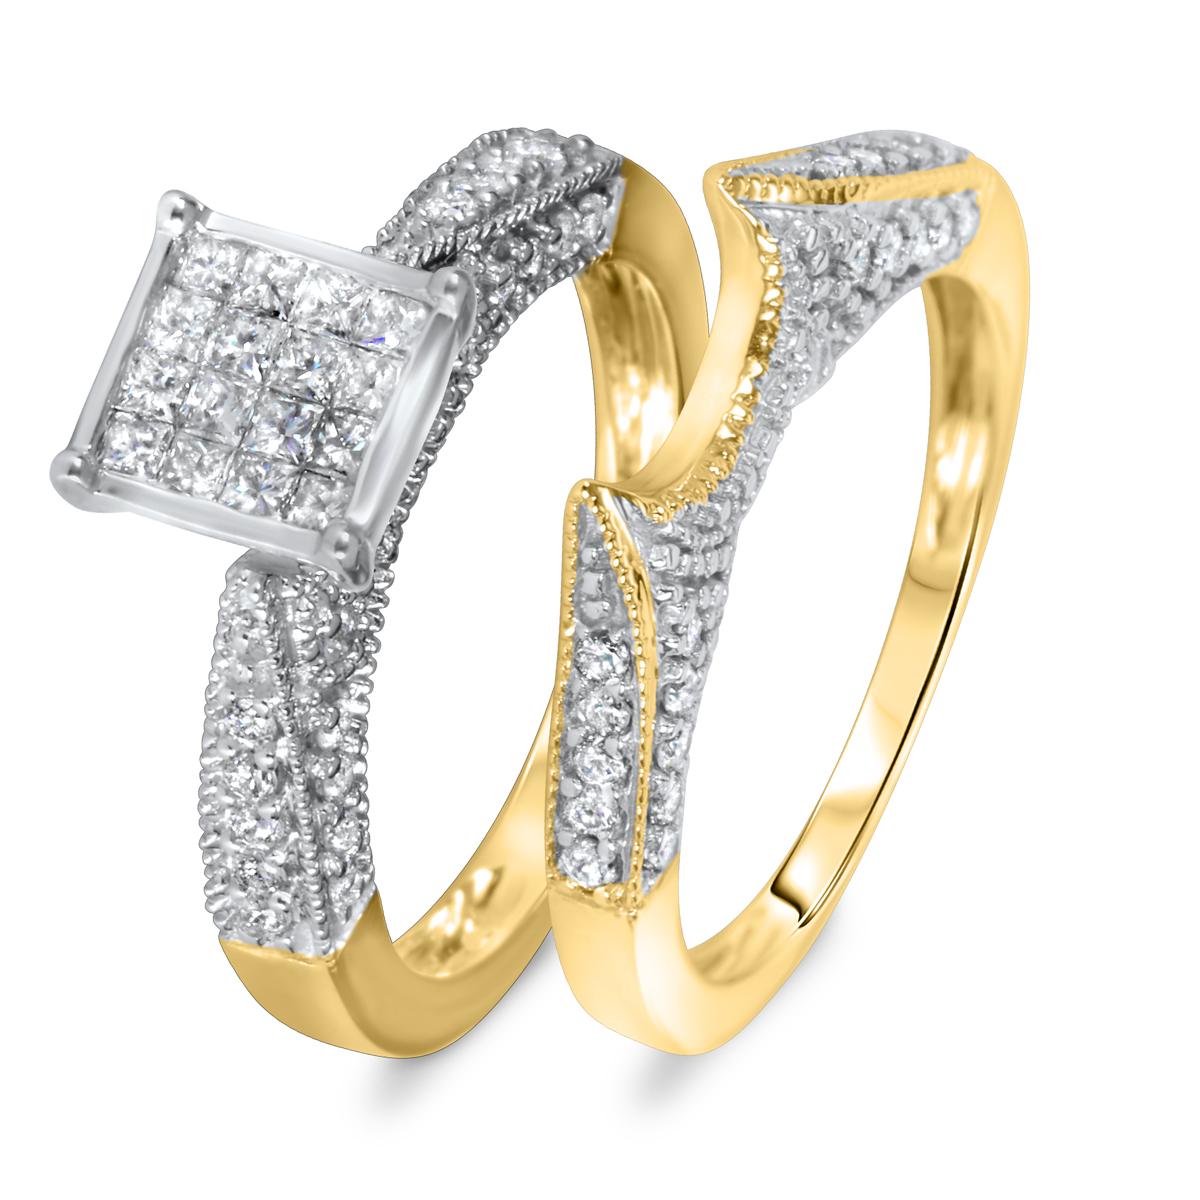 1 CT. T.W. Diamond Women's Bridal Wedding Ring Set 10K Yellow Gold